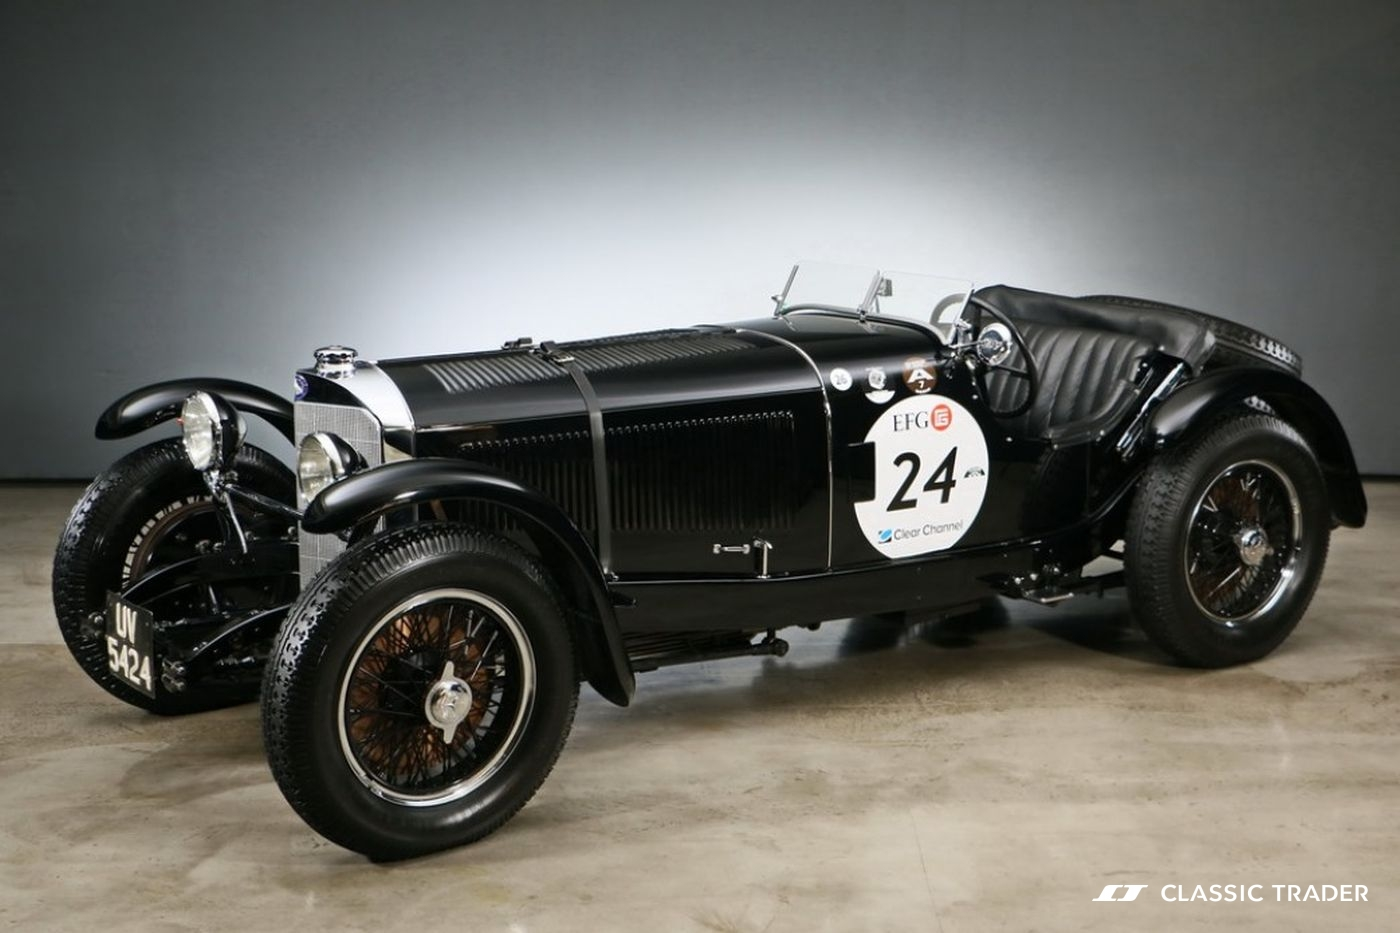 Fünf Vorkriegs-Klassiker Mercedes-Benz SSK 4